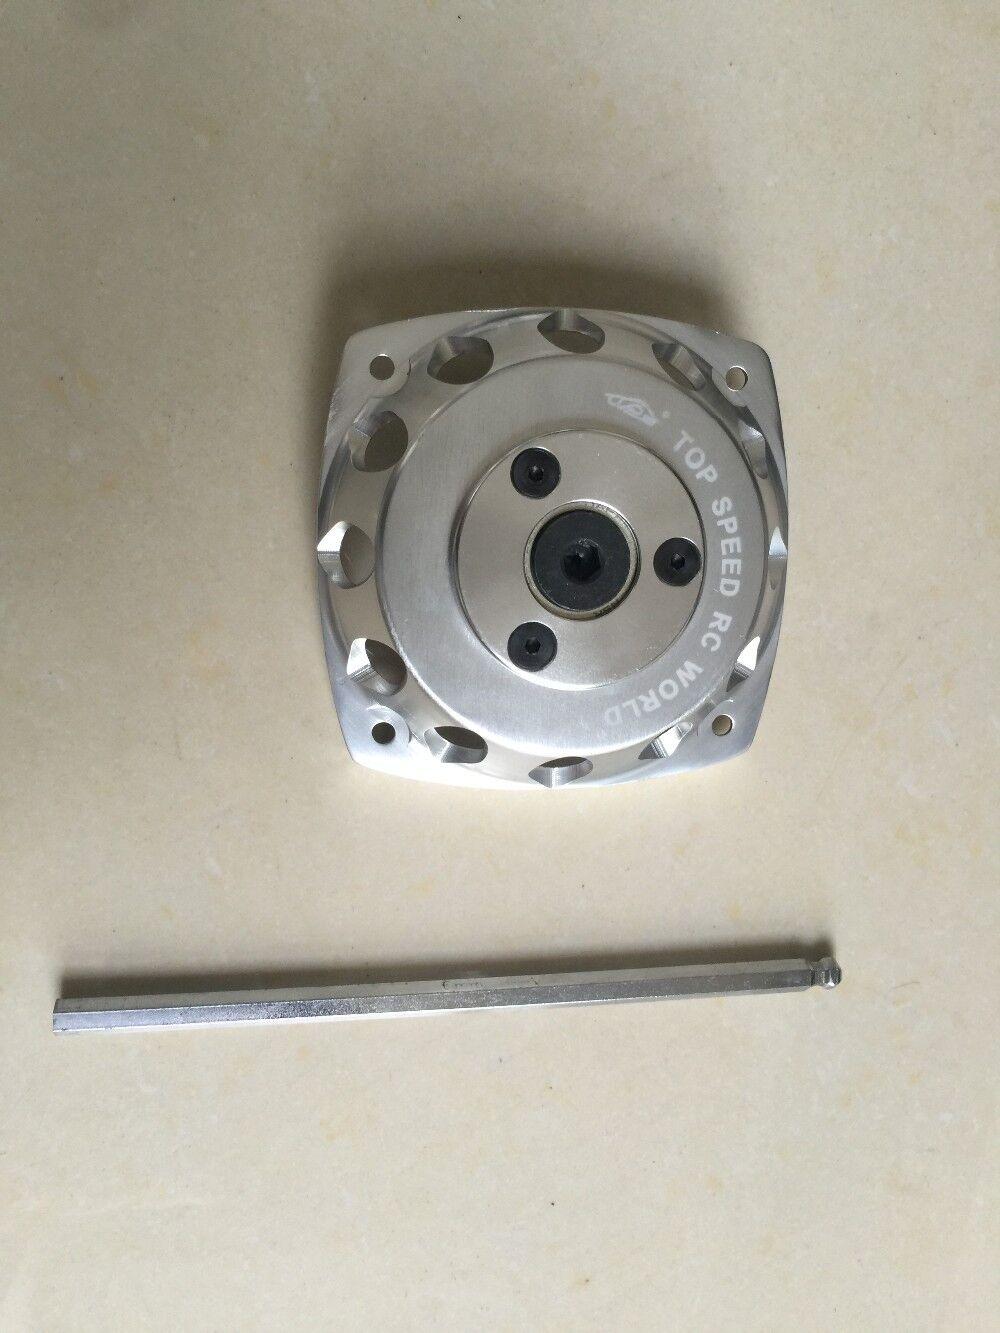 Metal Roto Starter fits Chung Yang Zenoah Engine for HPI FG Losi Rovan KM 5B